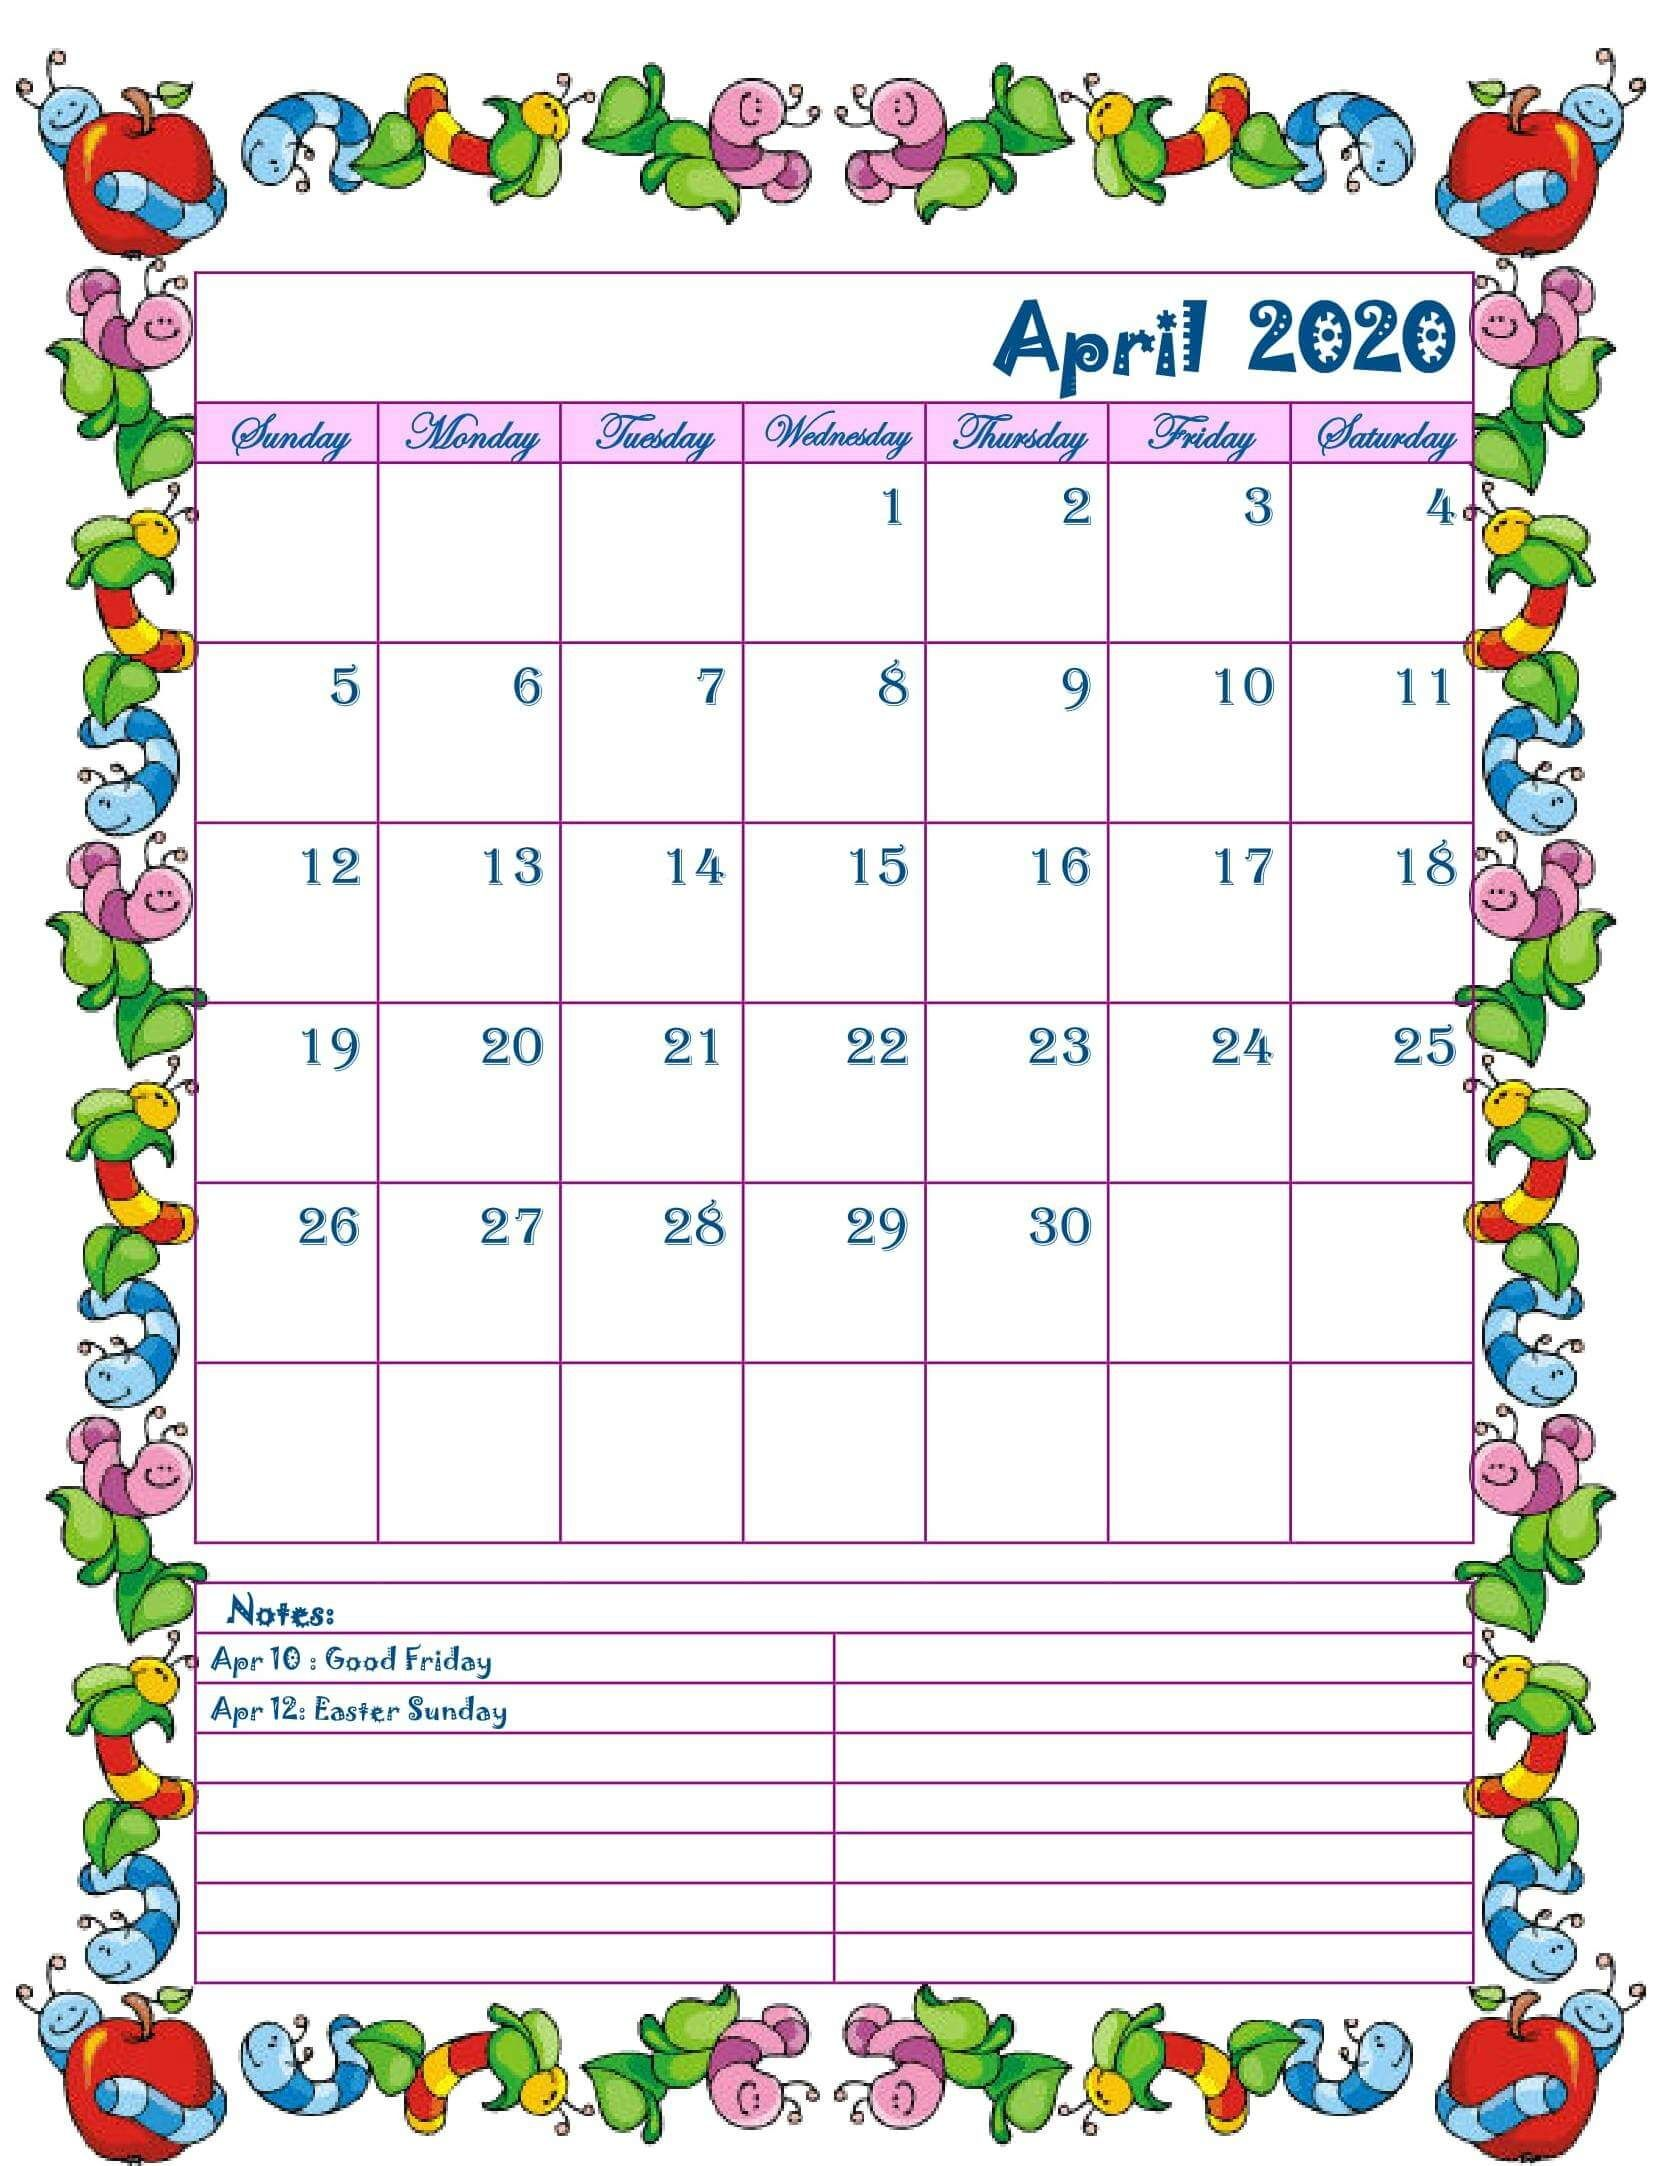 Floral April 2020 Calendar Cute Desk And Wall Wallpaper In 2020